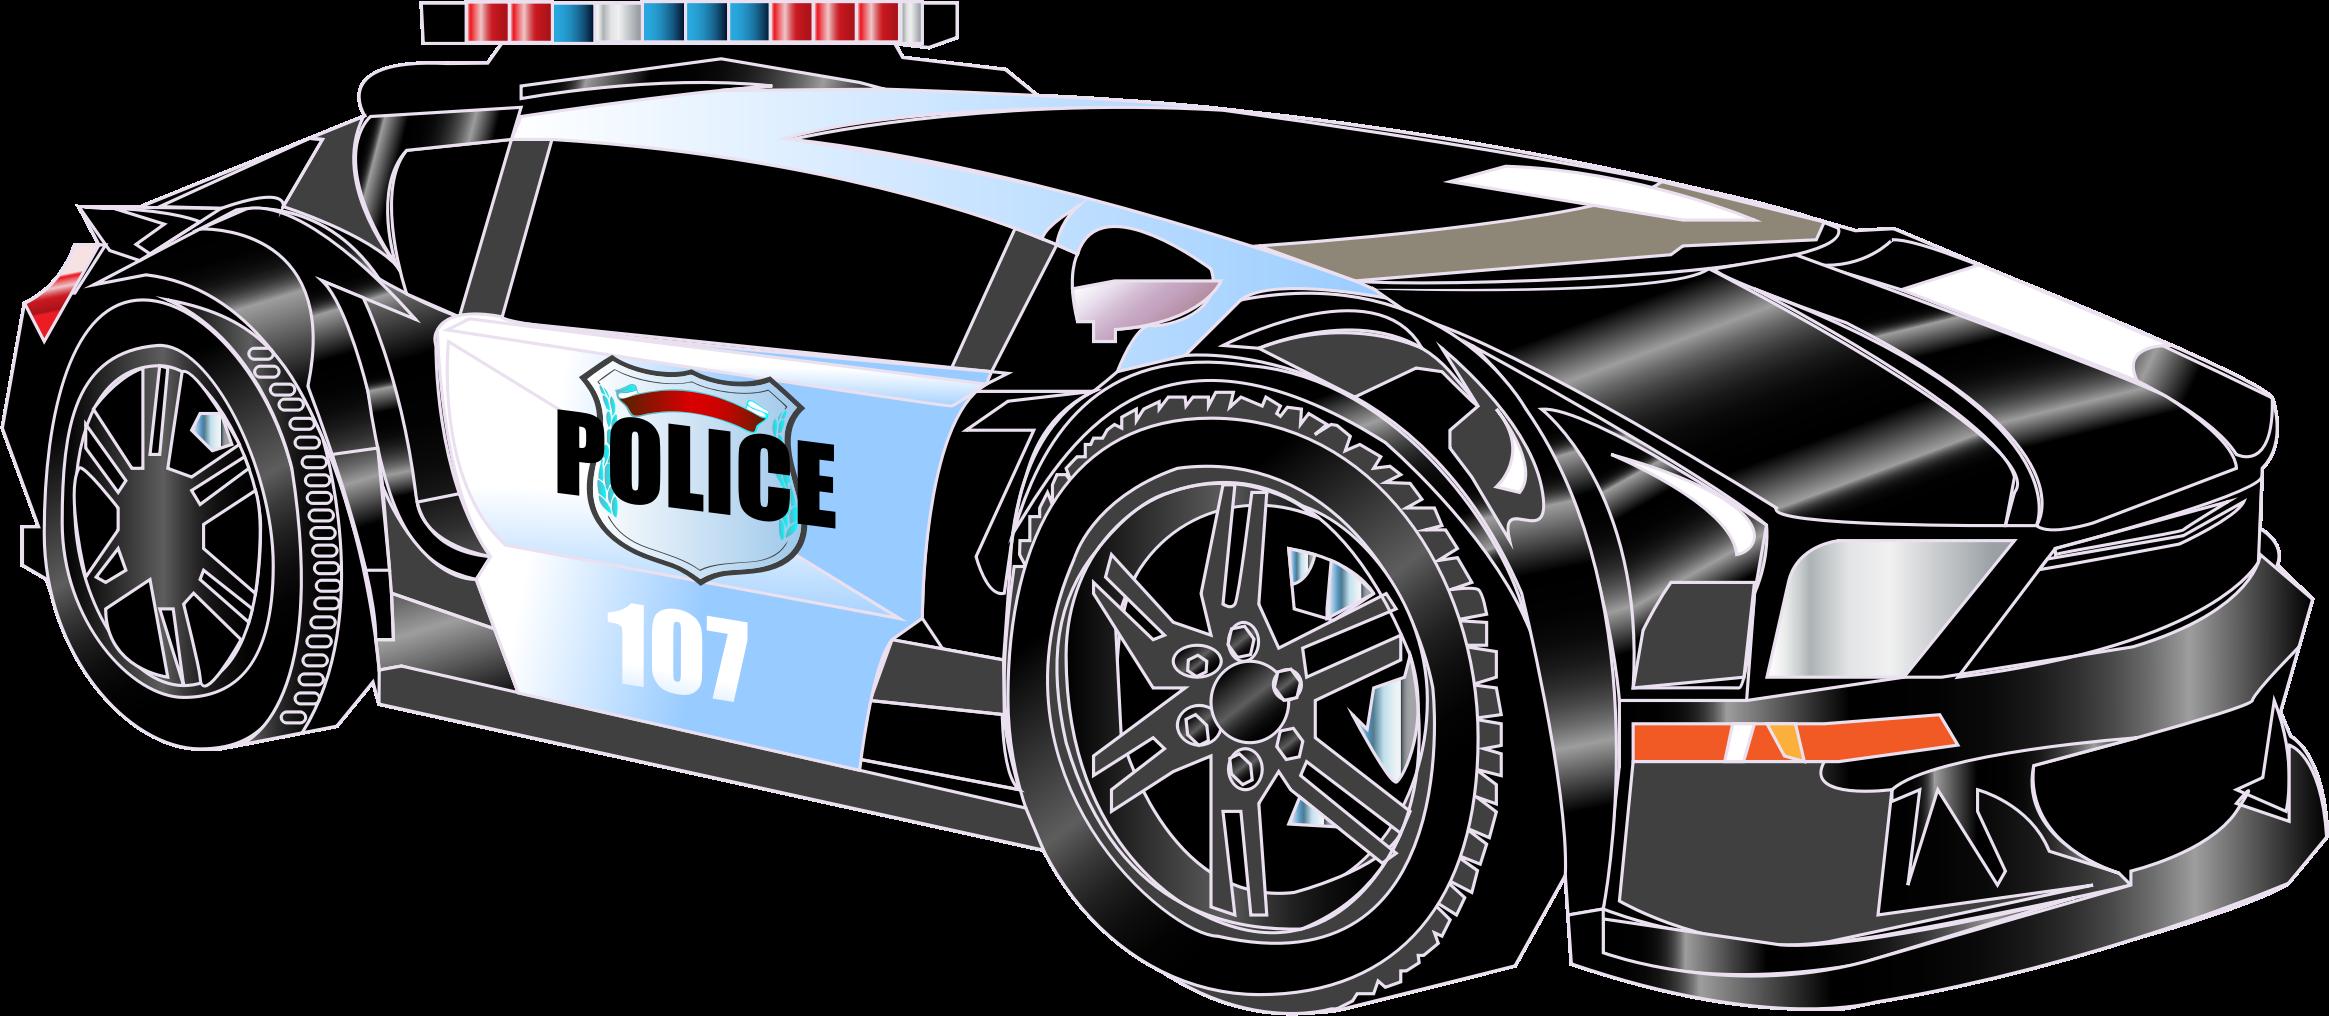 Clipart police car 2 - Police